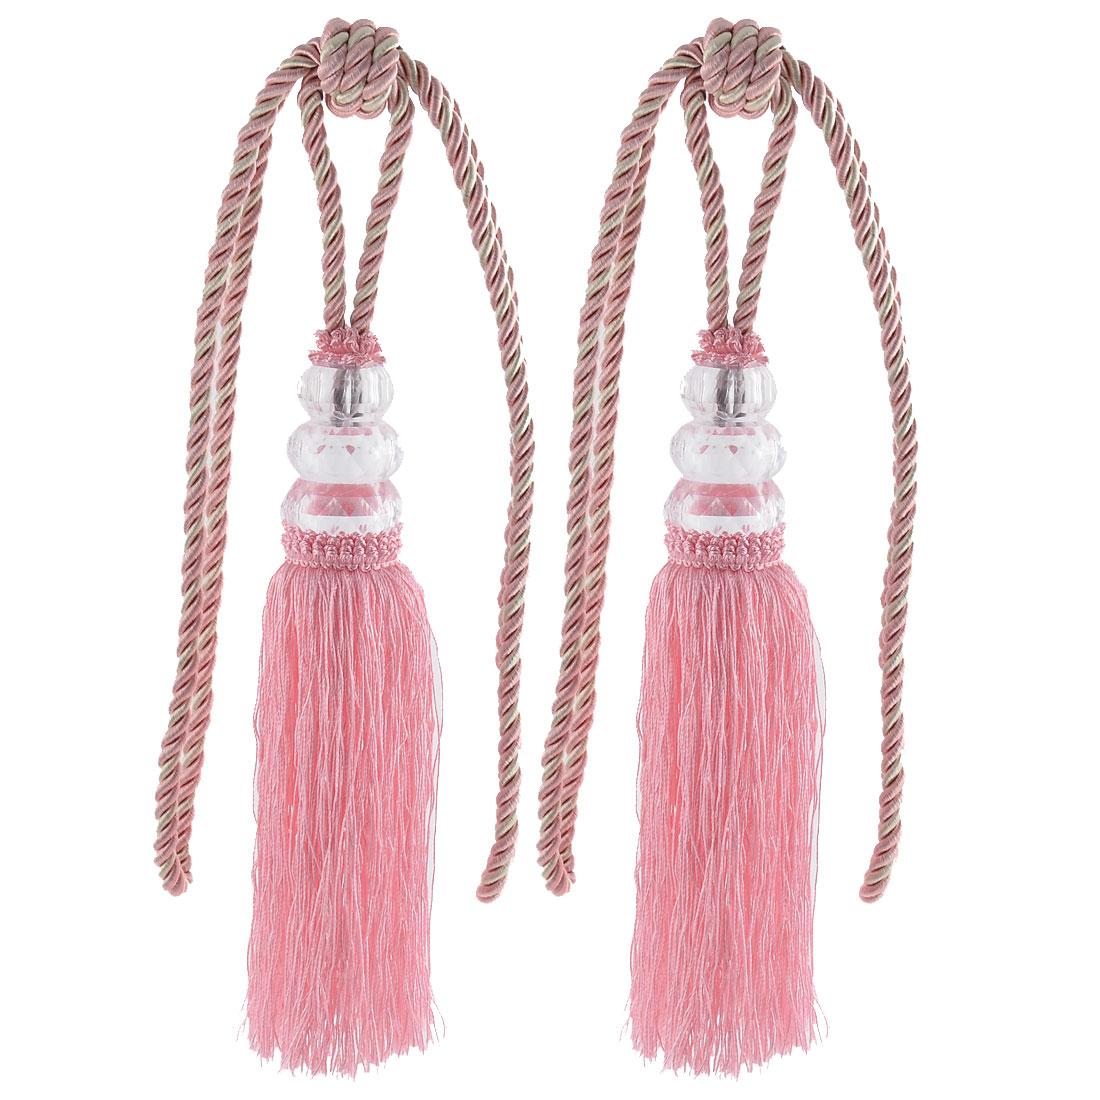 Home Plastic Bead Drapery Curtain Decoration Tassel Fringe Detail Tieback Rope Cord Pink Pair